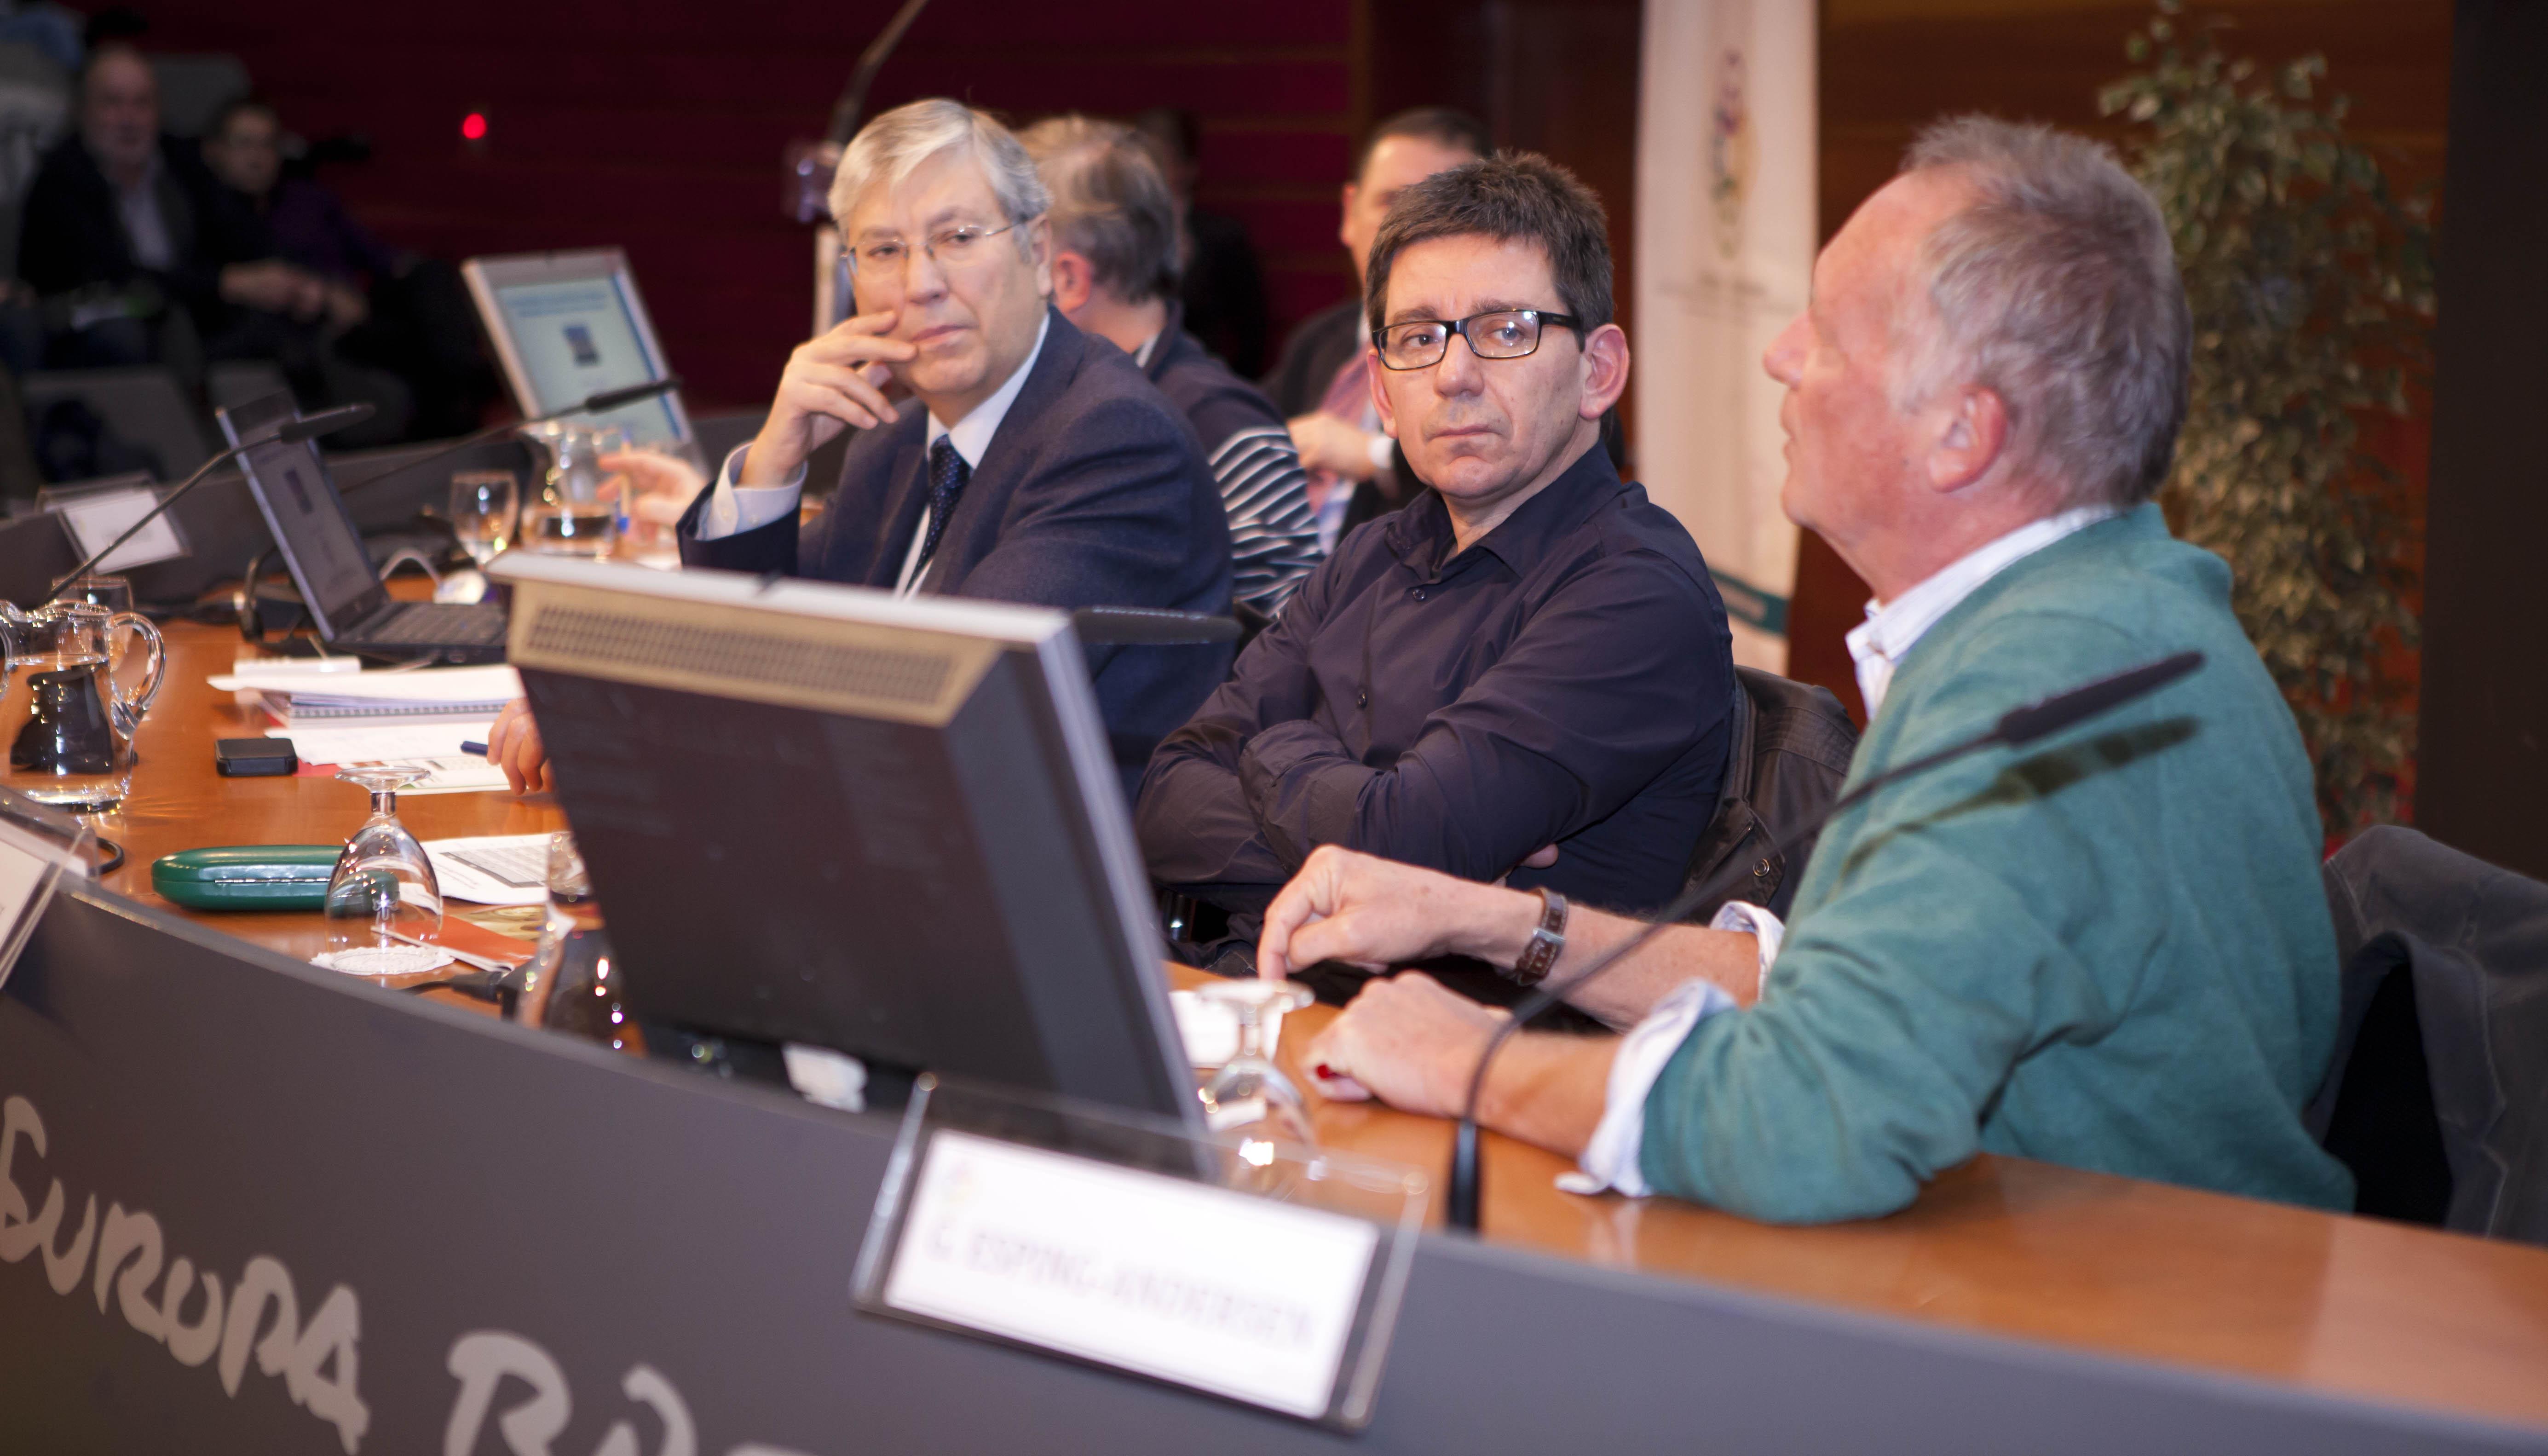 2012_11_06_congreso064.jpg